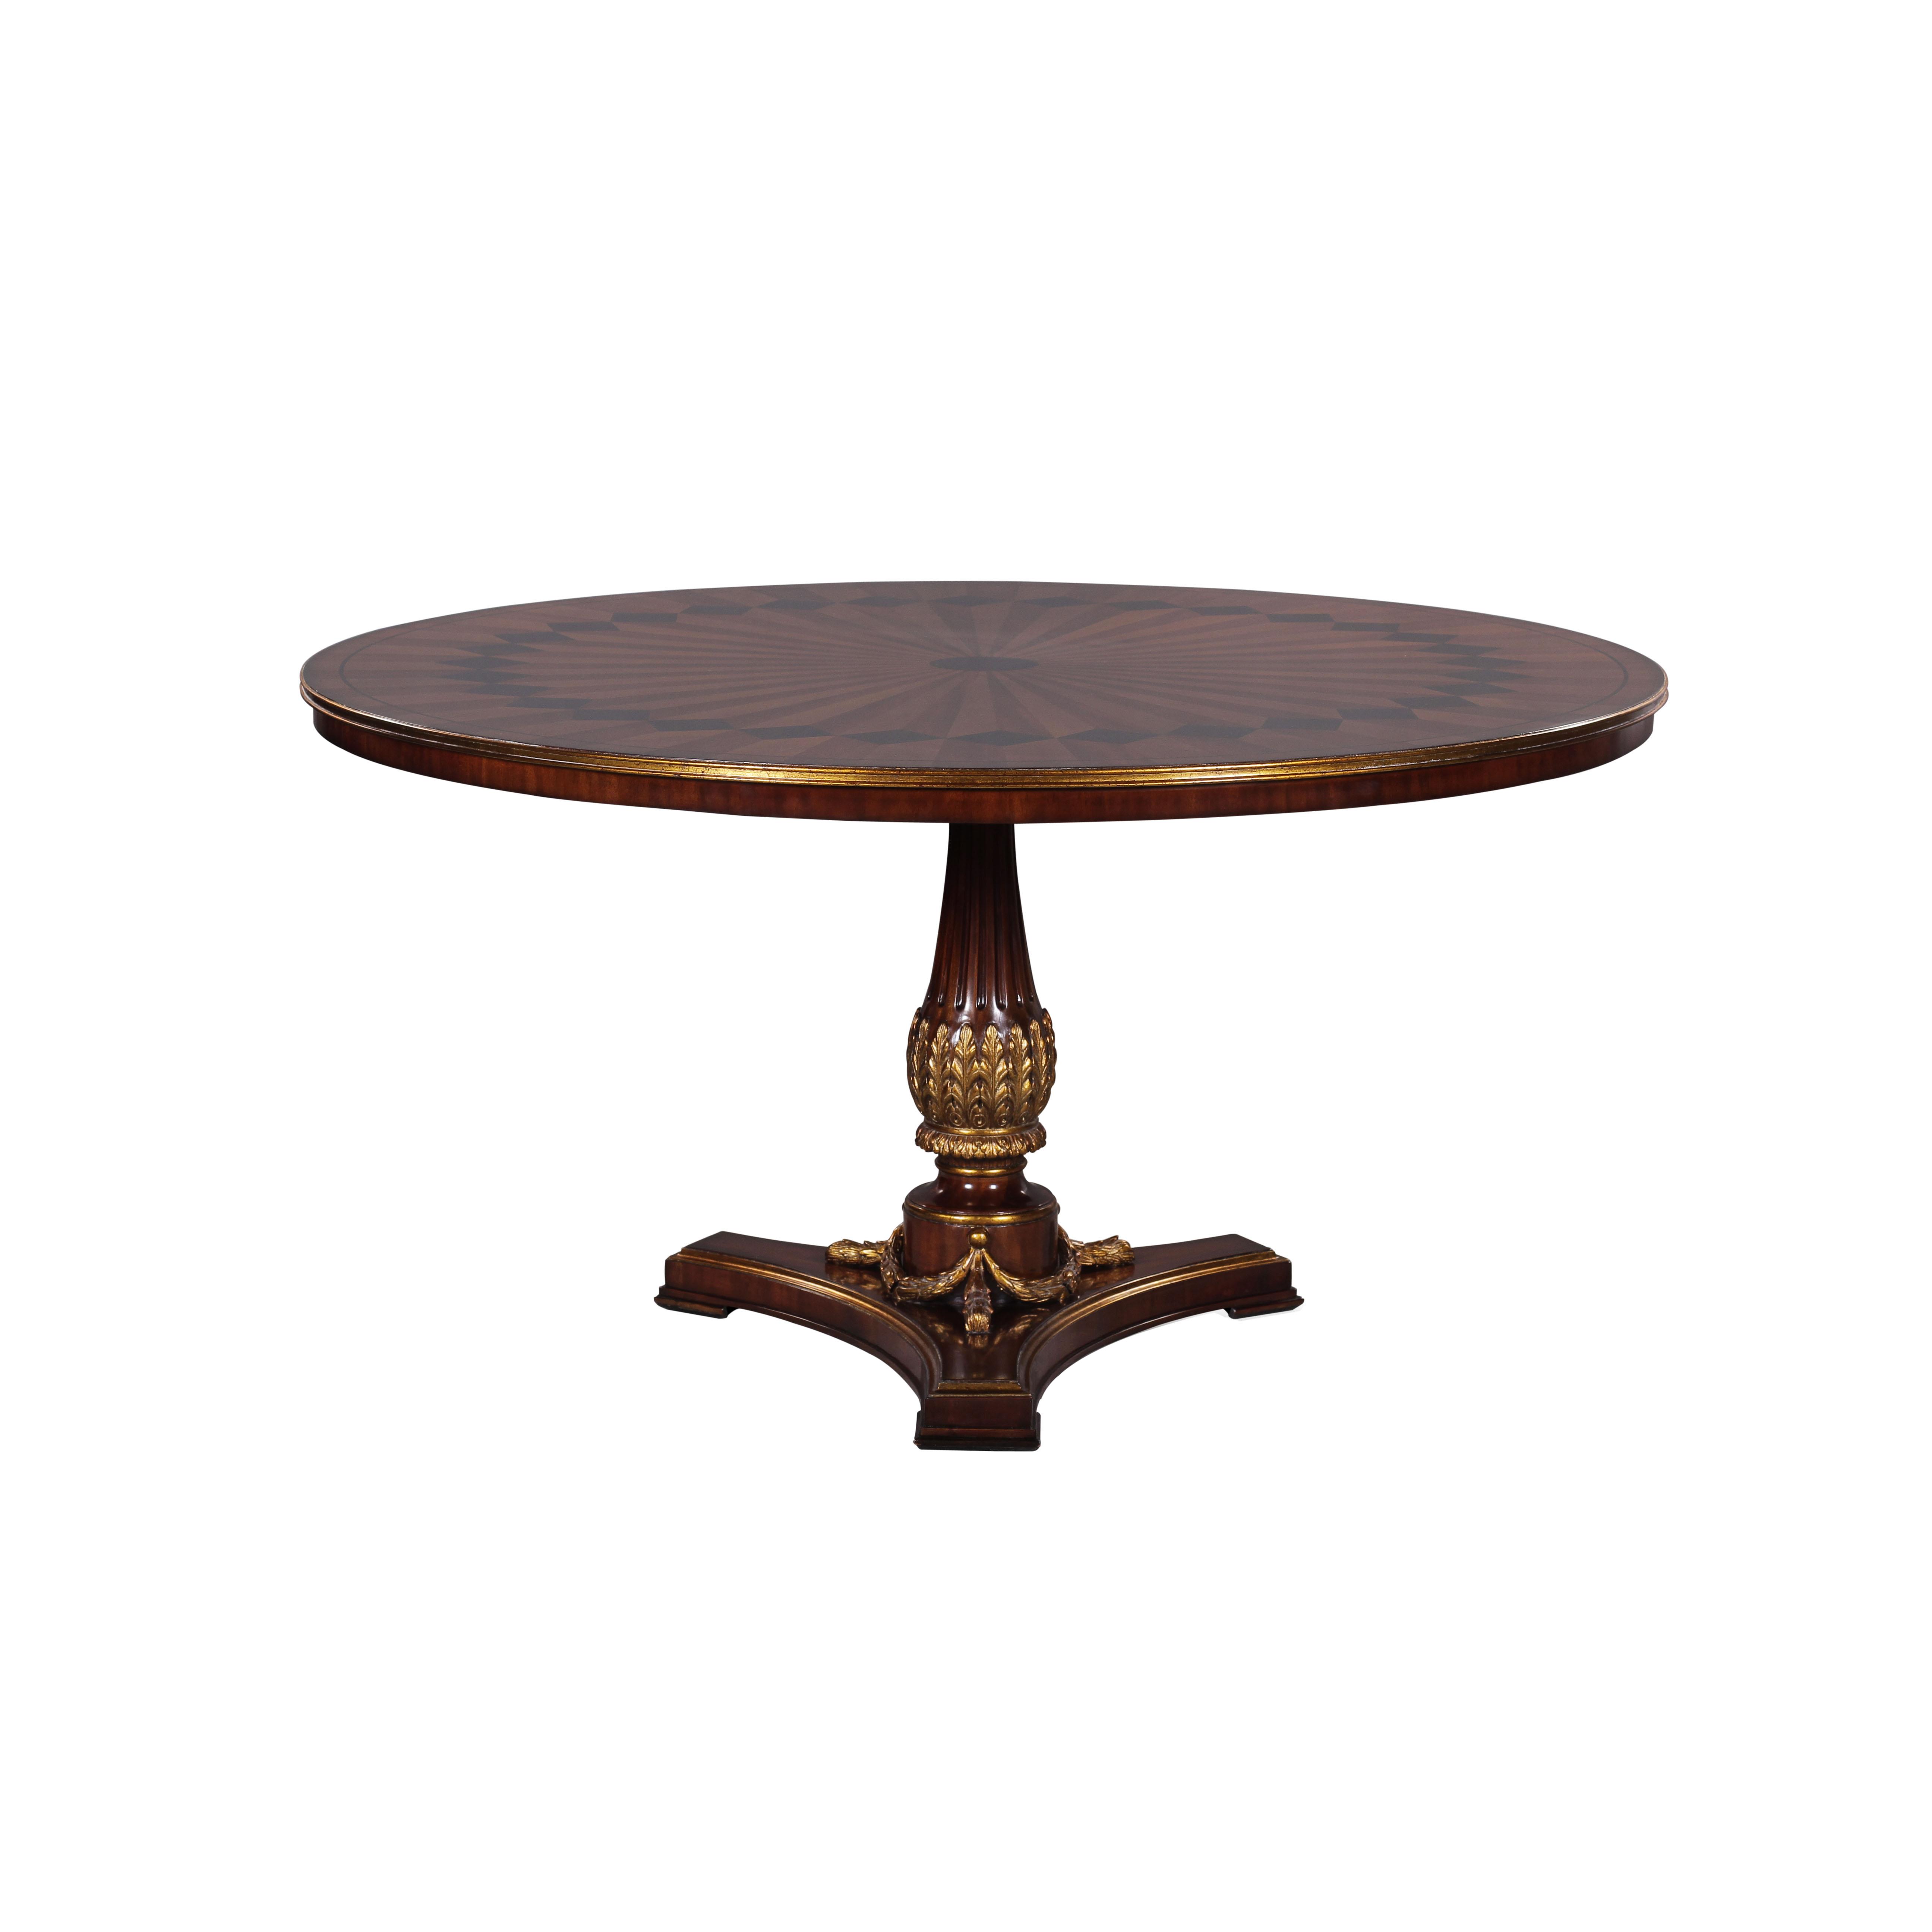 34417 - Dining Table Italian Inlaid 150, EM + NF9